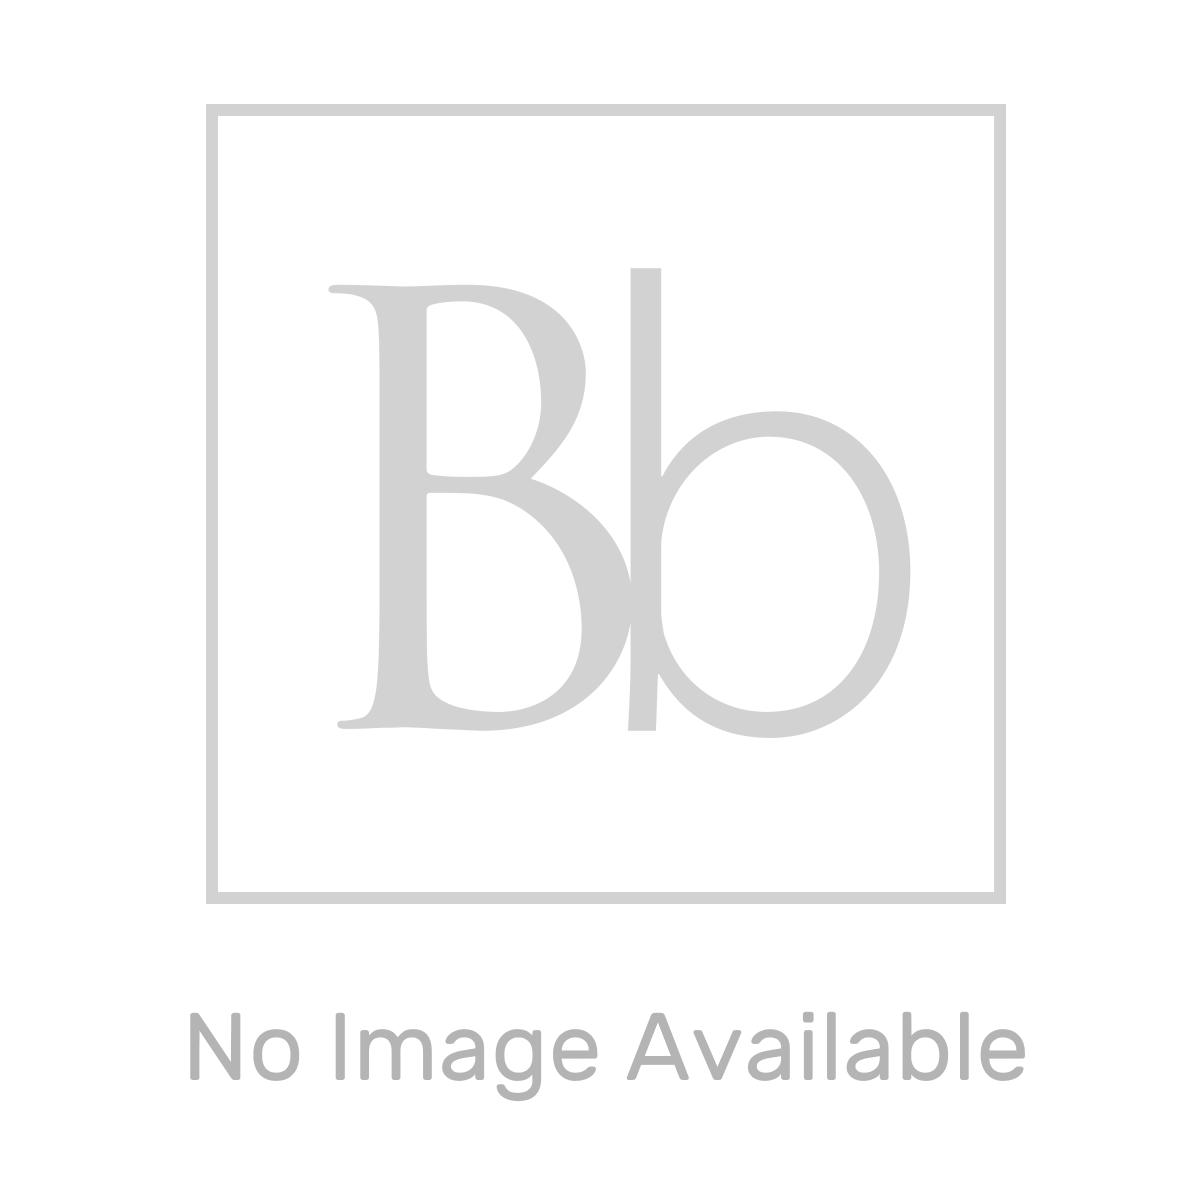 RAK Concealed Automatic Urinal Cistern 9.0L